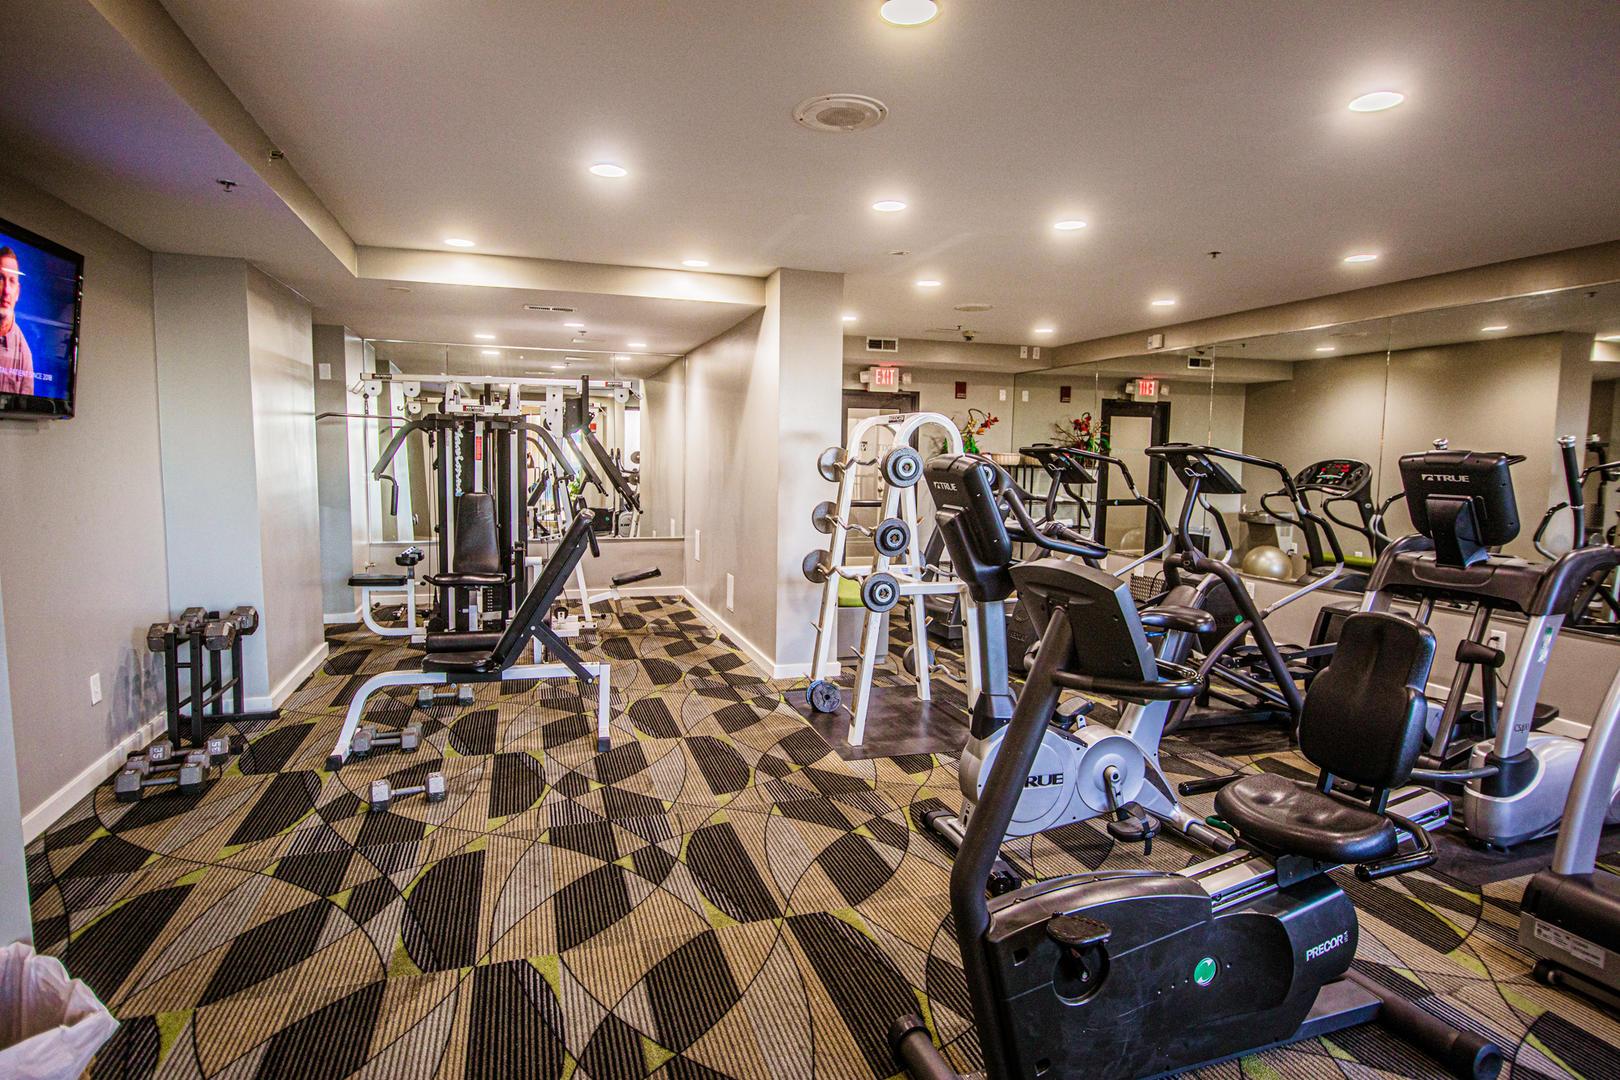 Patricia Grand - Fitness Center